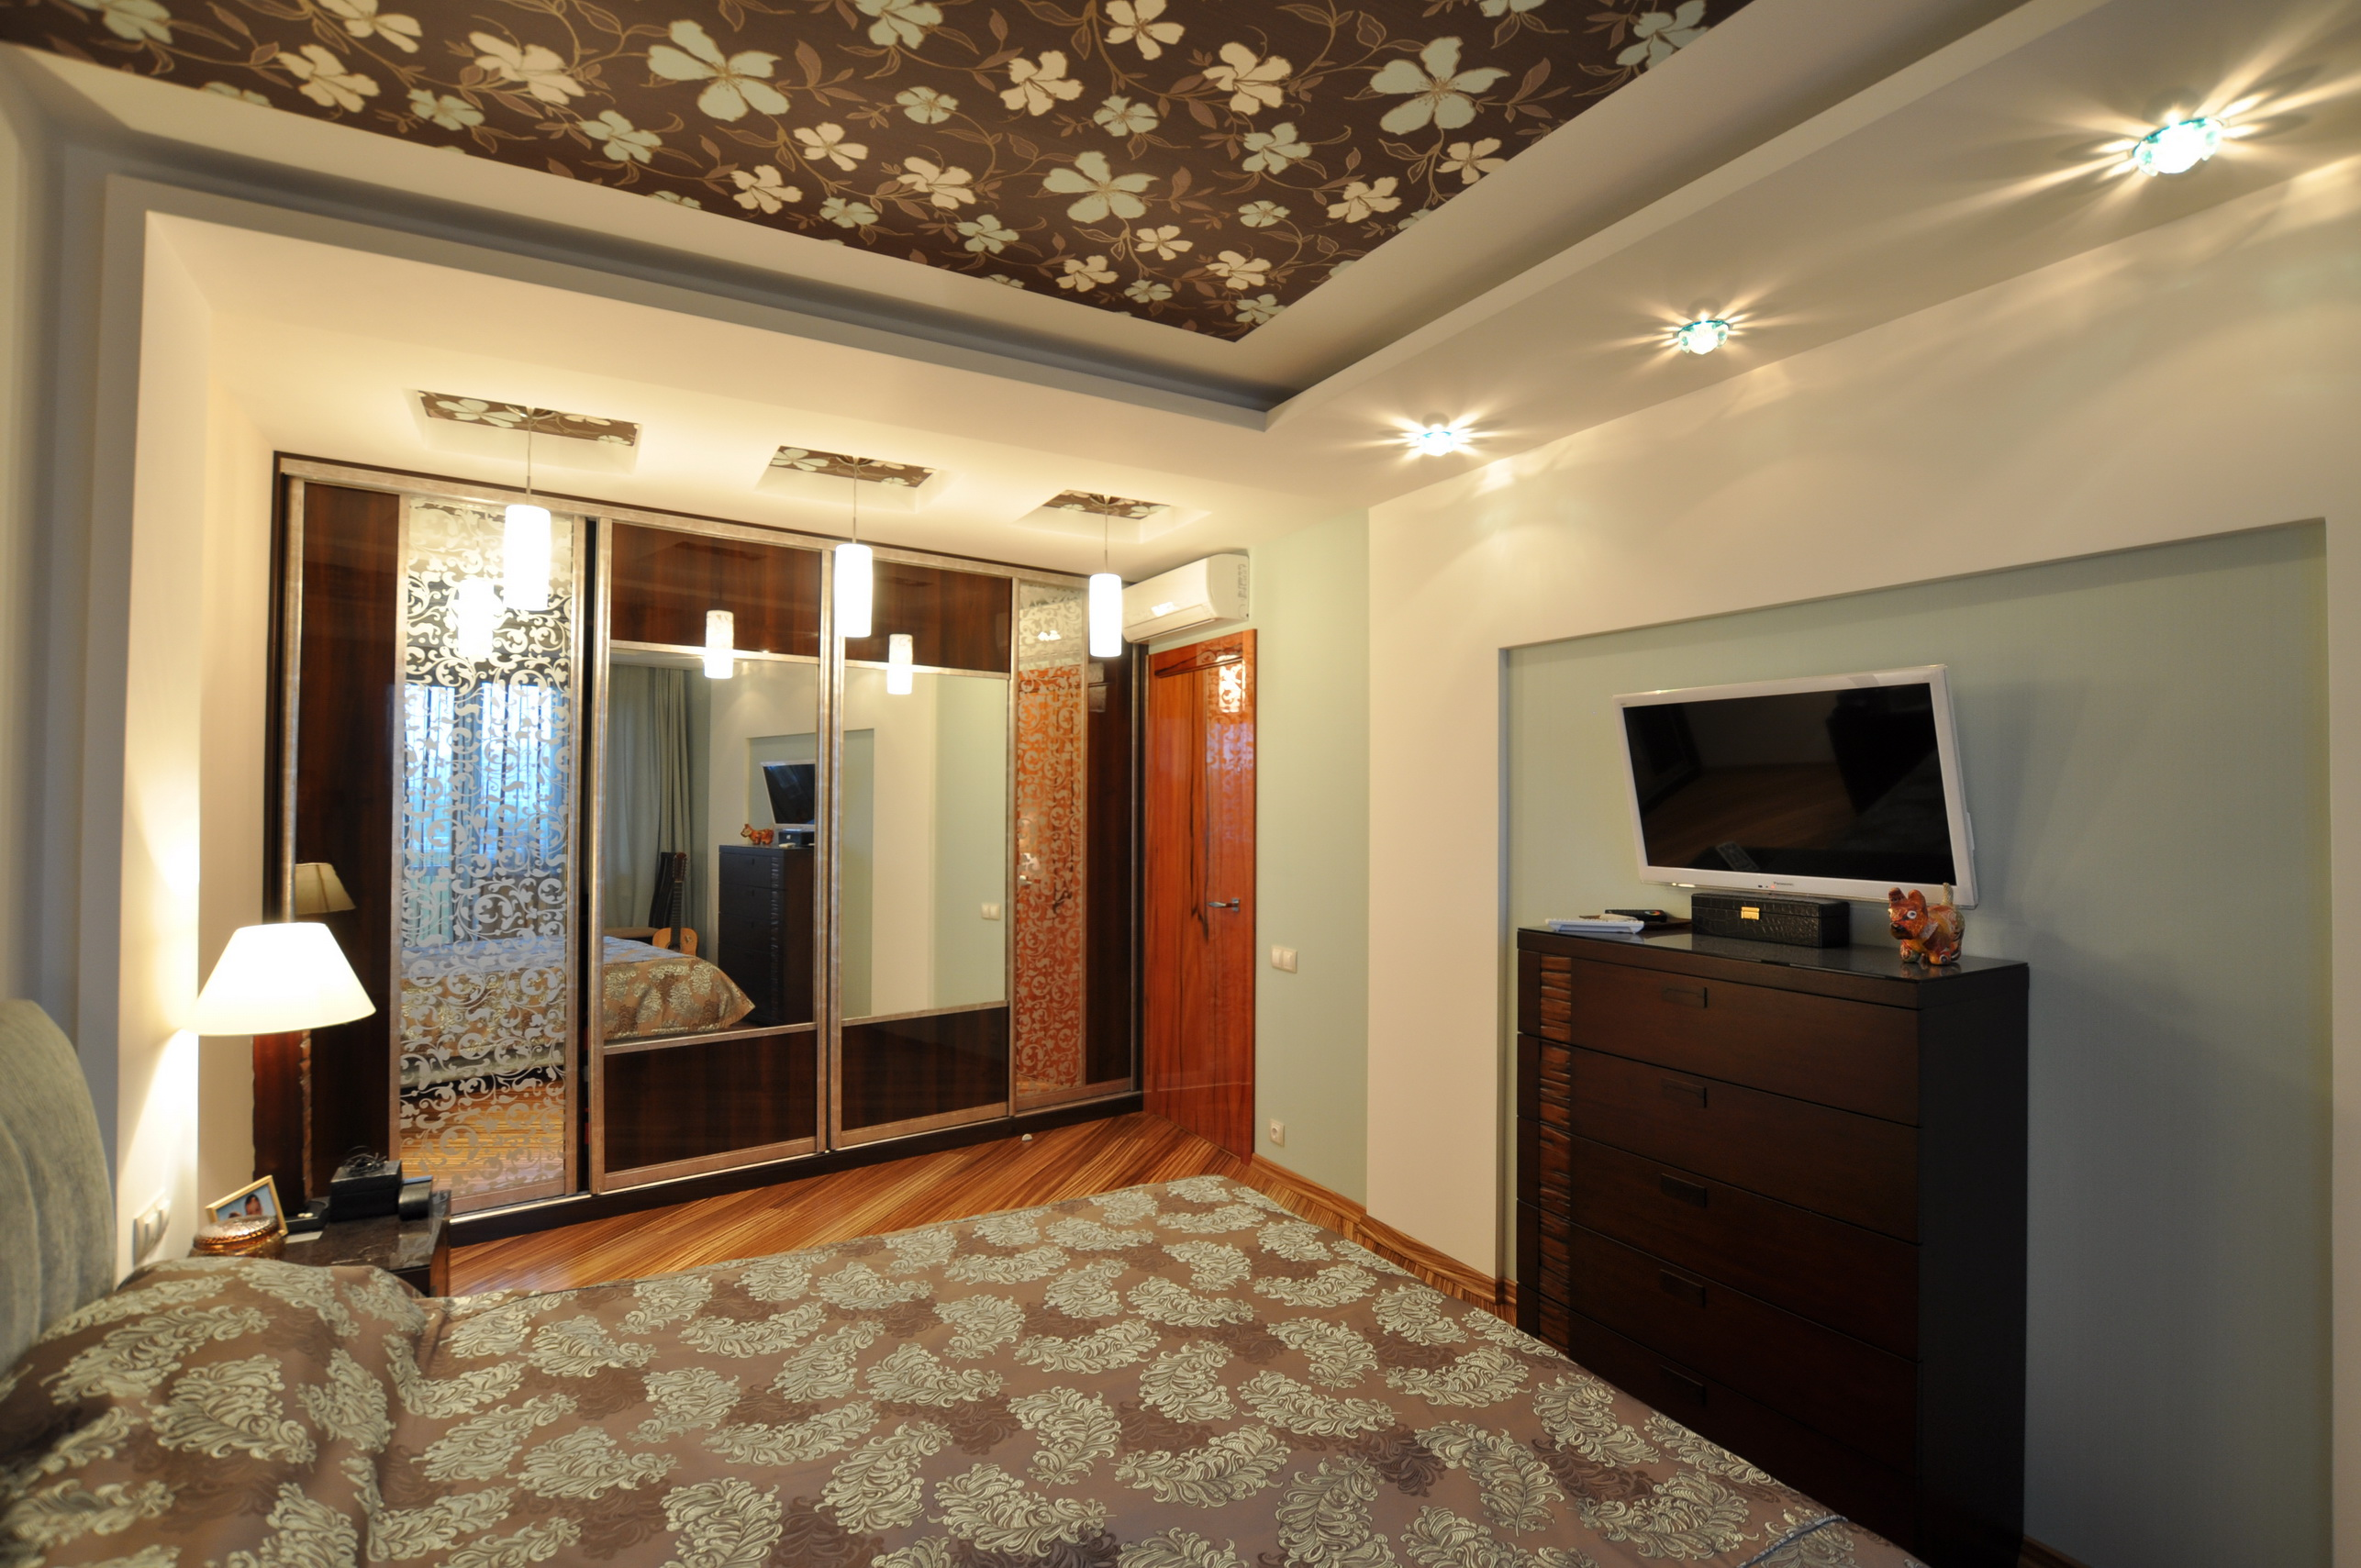 Квартира на ул. Одесская S=55 кв м. Спальня.